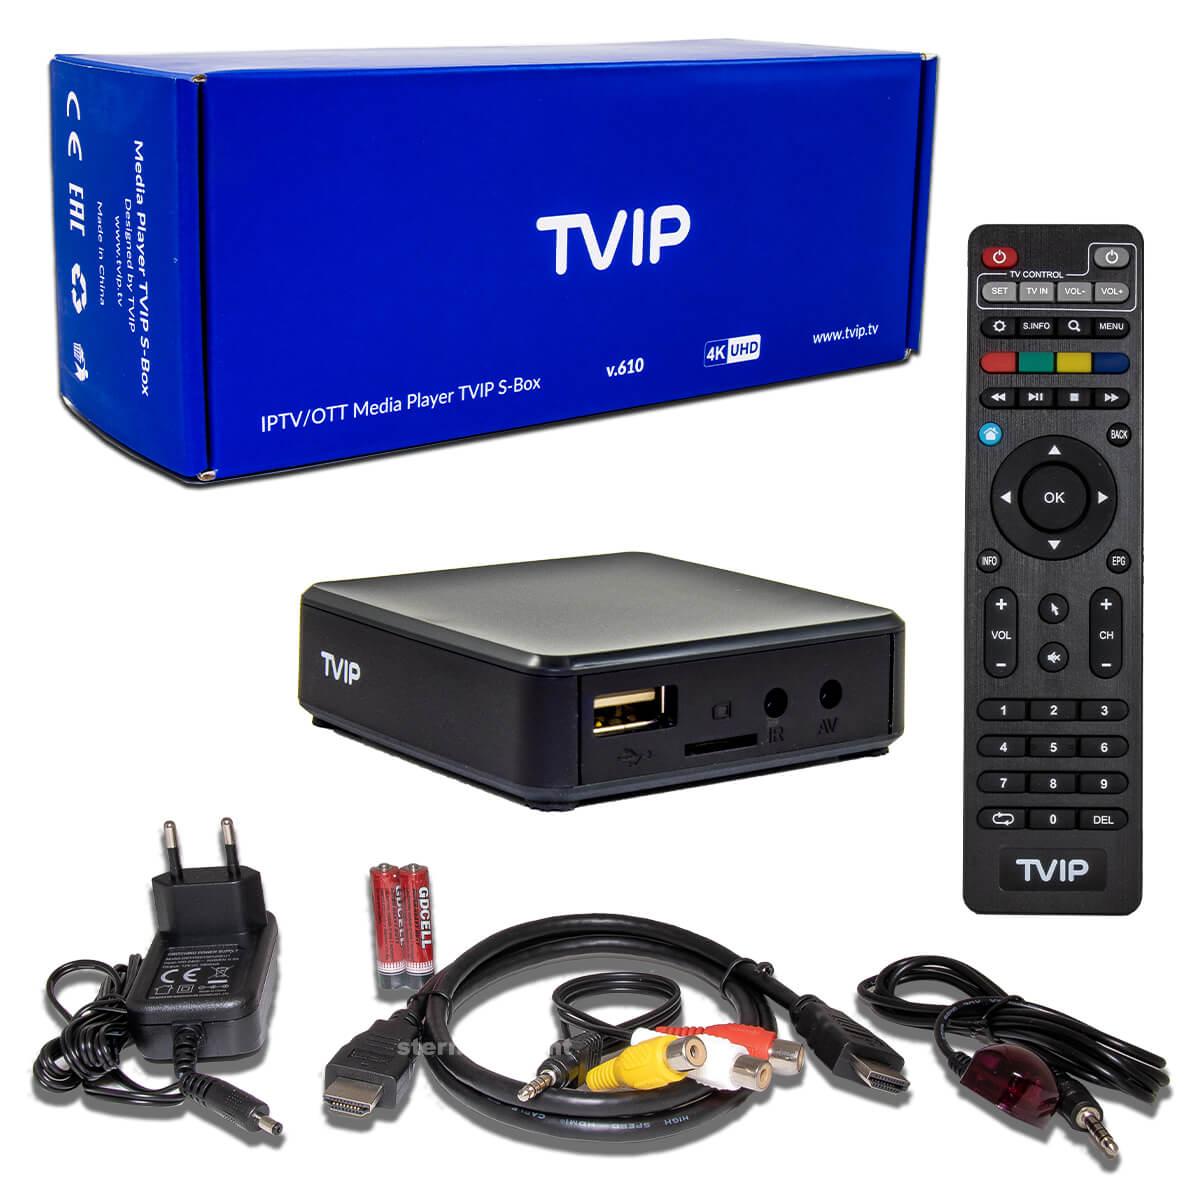 tvip-s-box-v-610-lieferumfang-paket